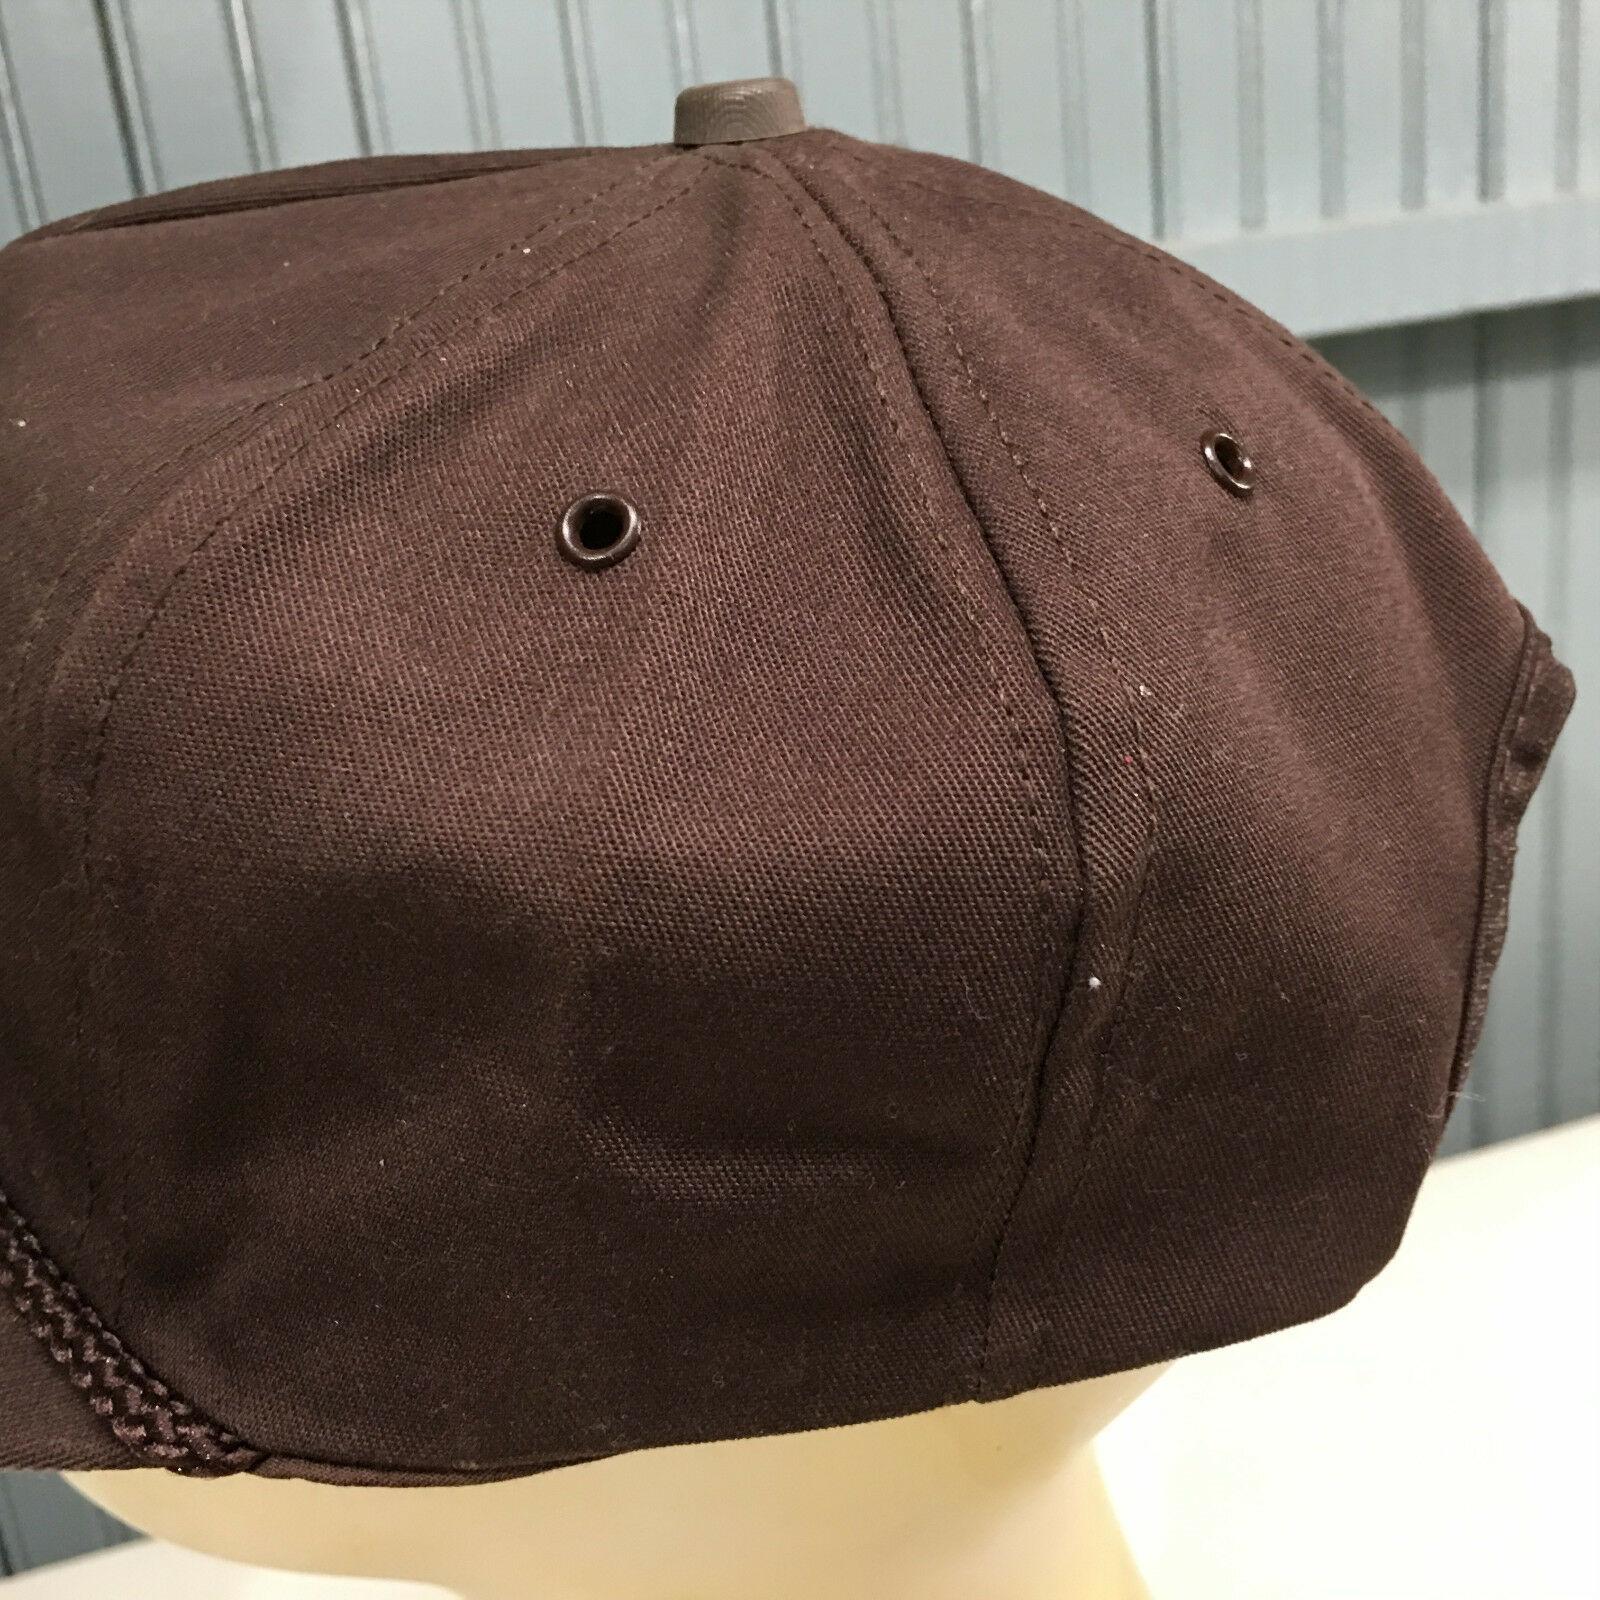 VTG U-Haul Moving Storage Patched Made in USA Snapback Baseball Cap Hat image 3